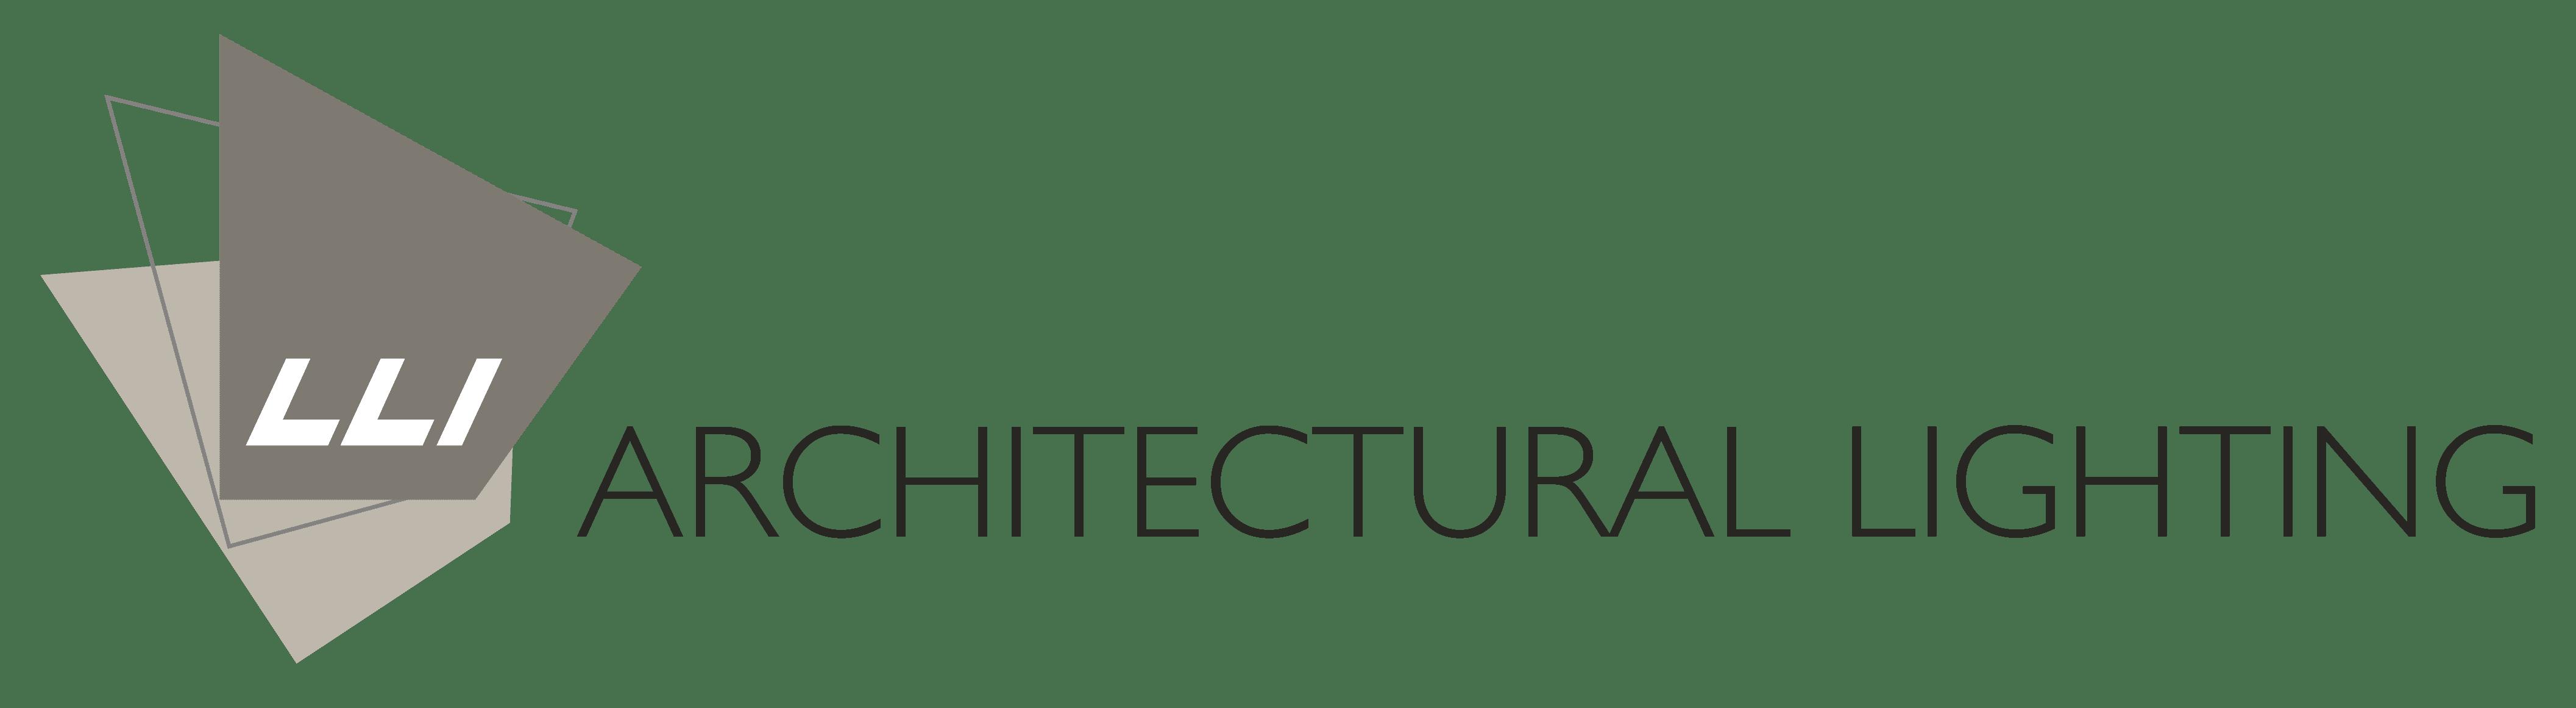 lli architectural  sc 1 st  KSA Lighting & Linecard - KSA azcodes.com